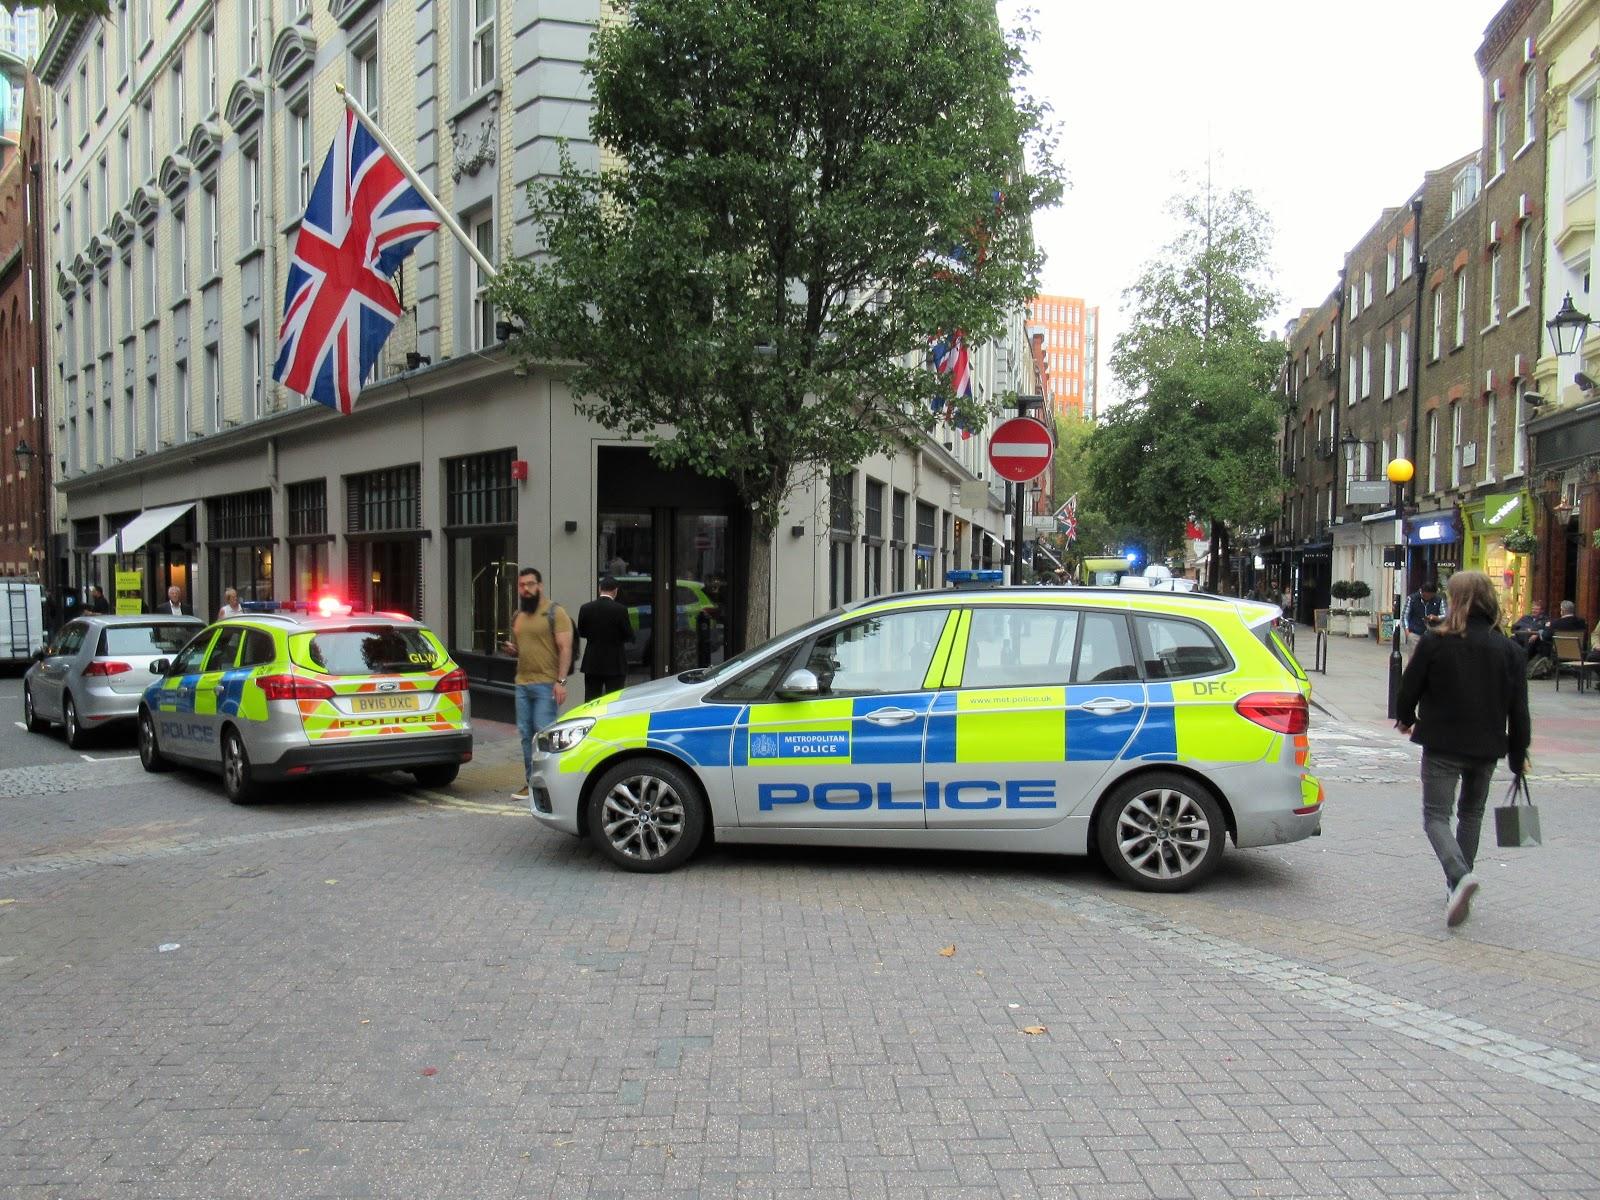 Martin Brookes Oakham Rutland England: Metropolitan Police and